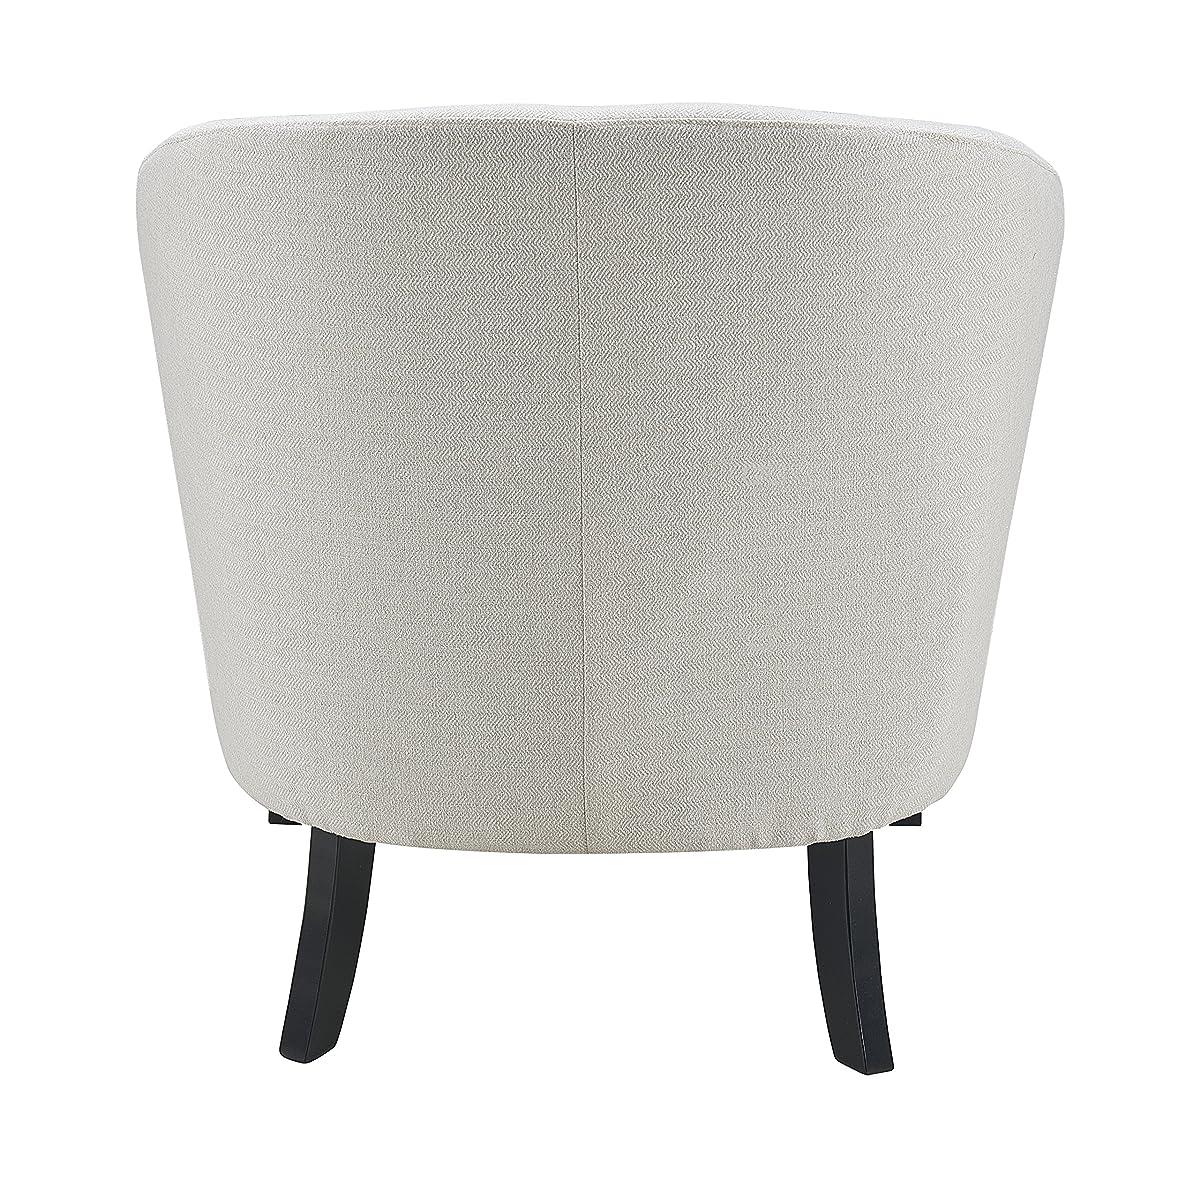 Serta UPH20019C Artesia, Accent Chair, Catalina Ivory